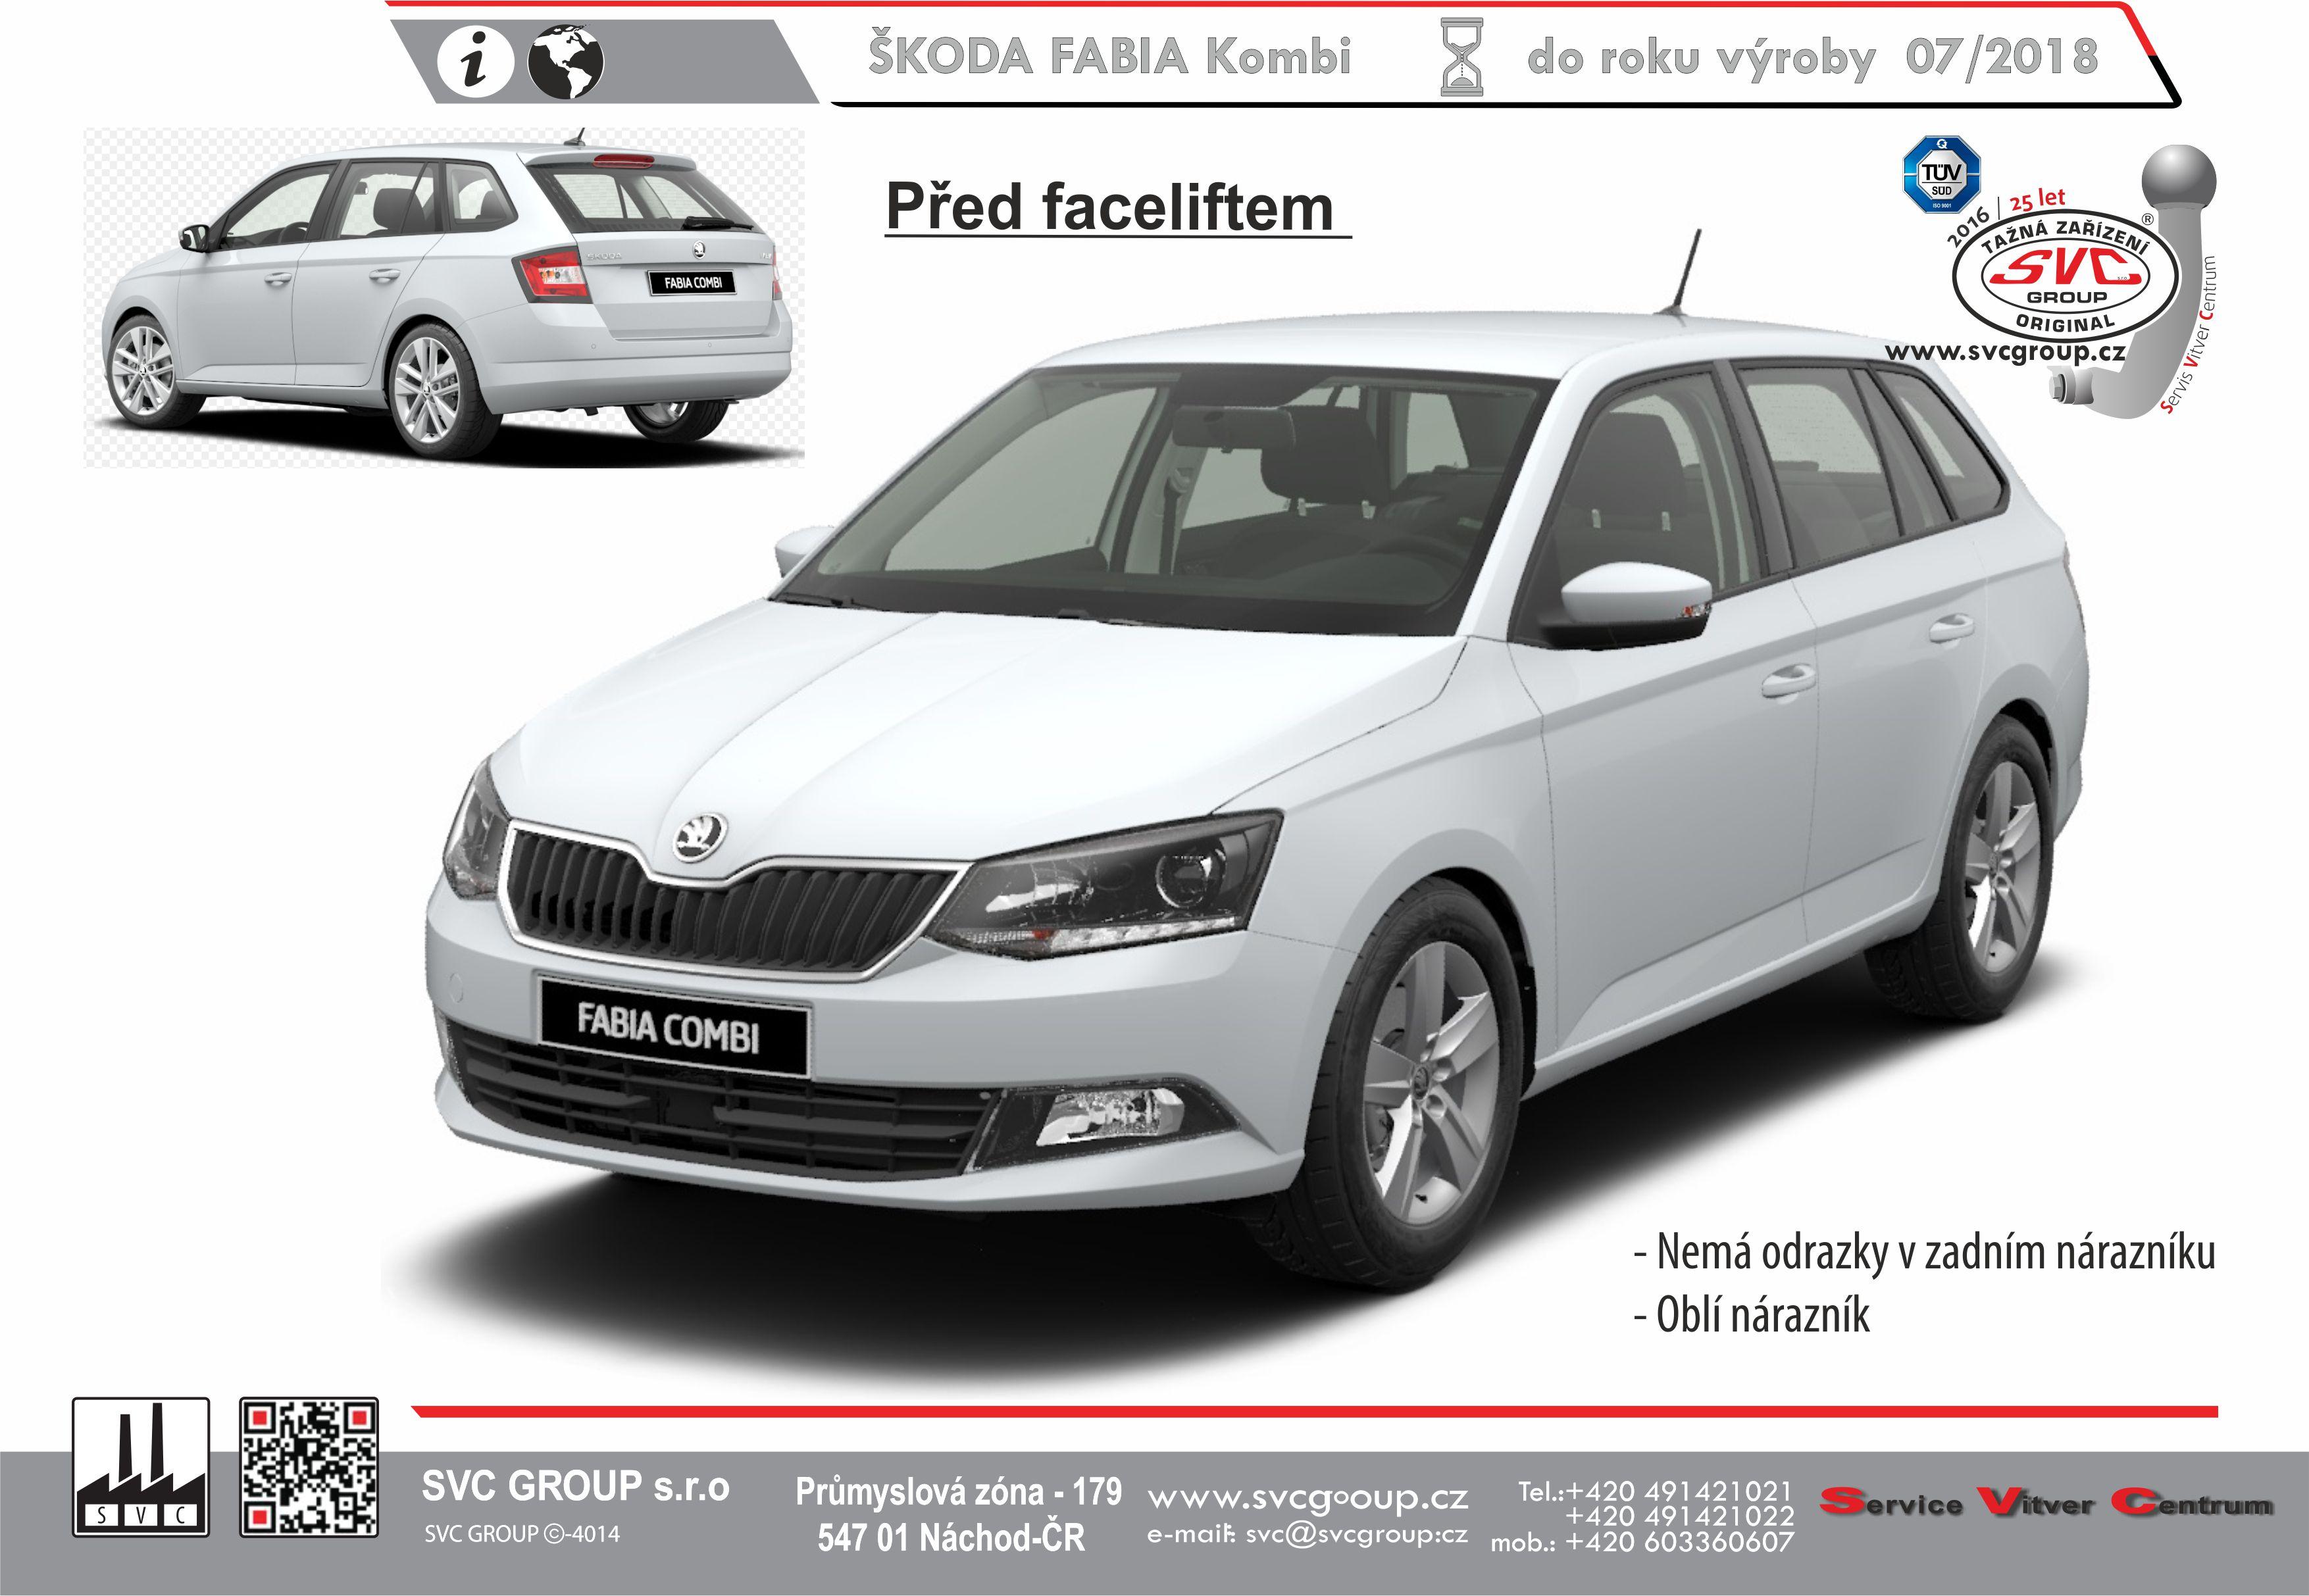 Škoda Fabia Kombi